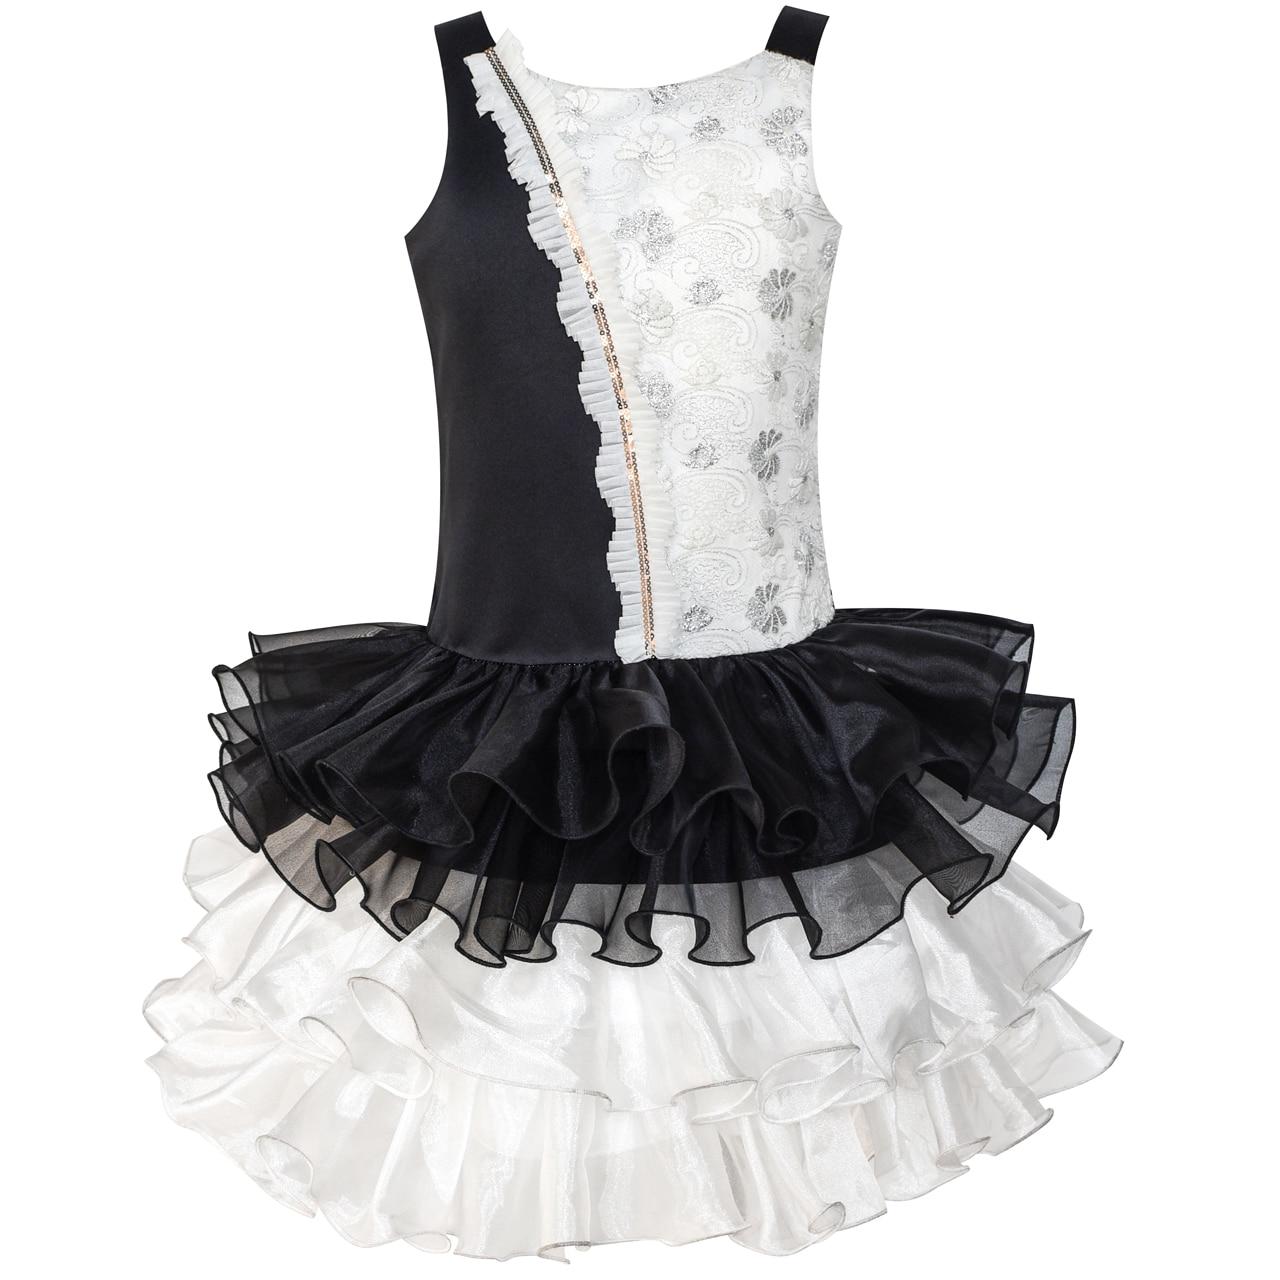 Girls Dress Black White Color Contrast Tutu Dancing Dress 2018 Summer Princess Wedding Party Dresses Girl Clothes Size 4-8 classic contrast color club mini dress black white